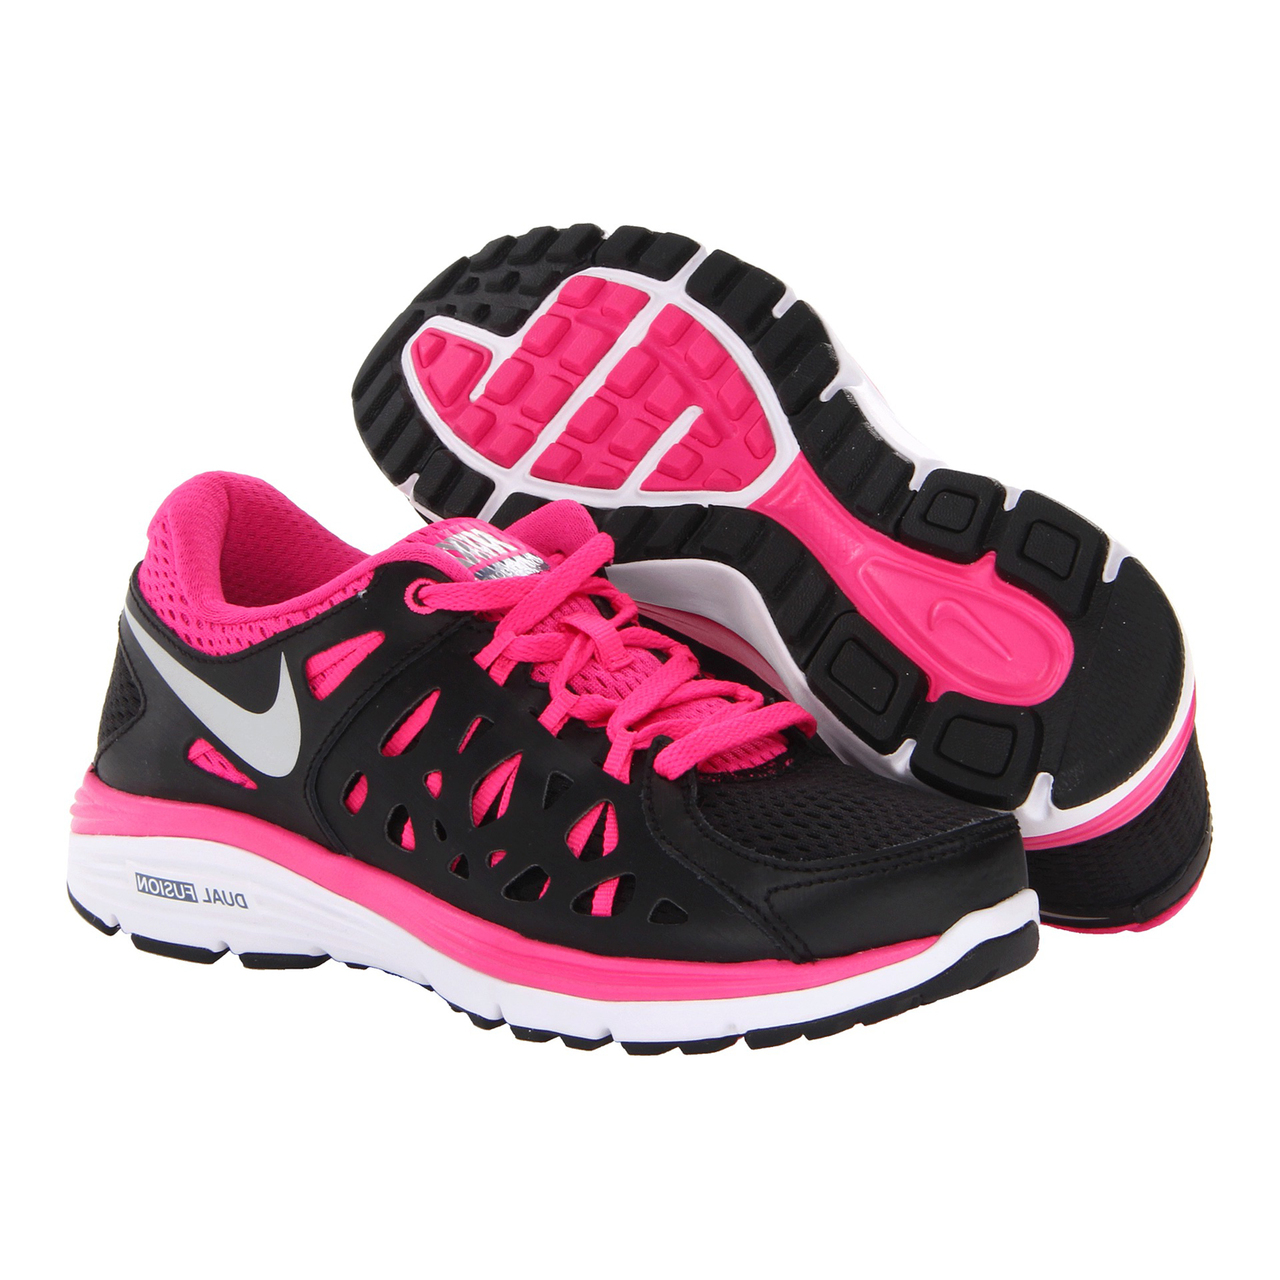 36bc44cff832ad Nike Dual Fusion Run 2 Black Pink Ladies Running Shoes - Shop now   Shoolu